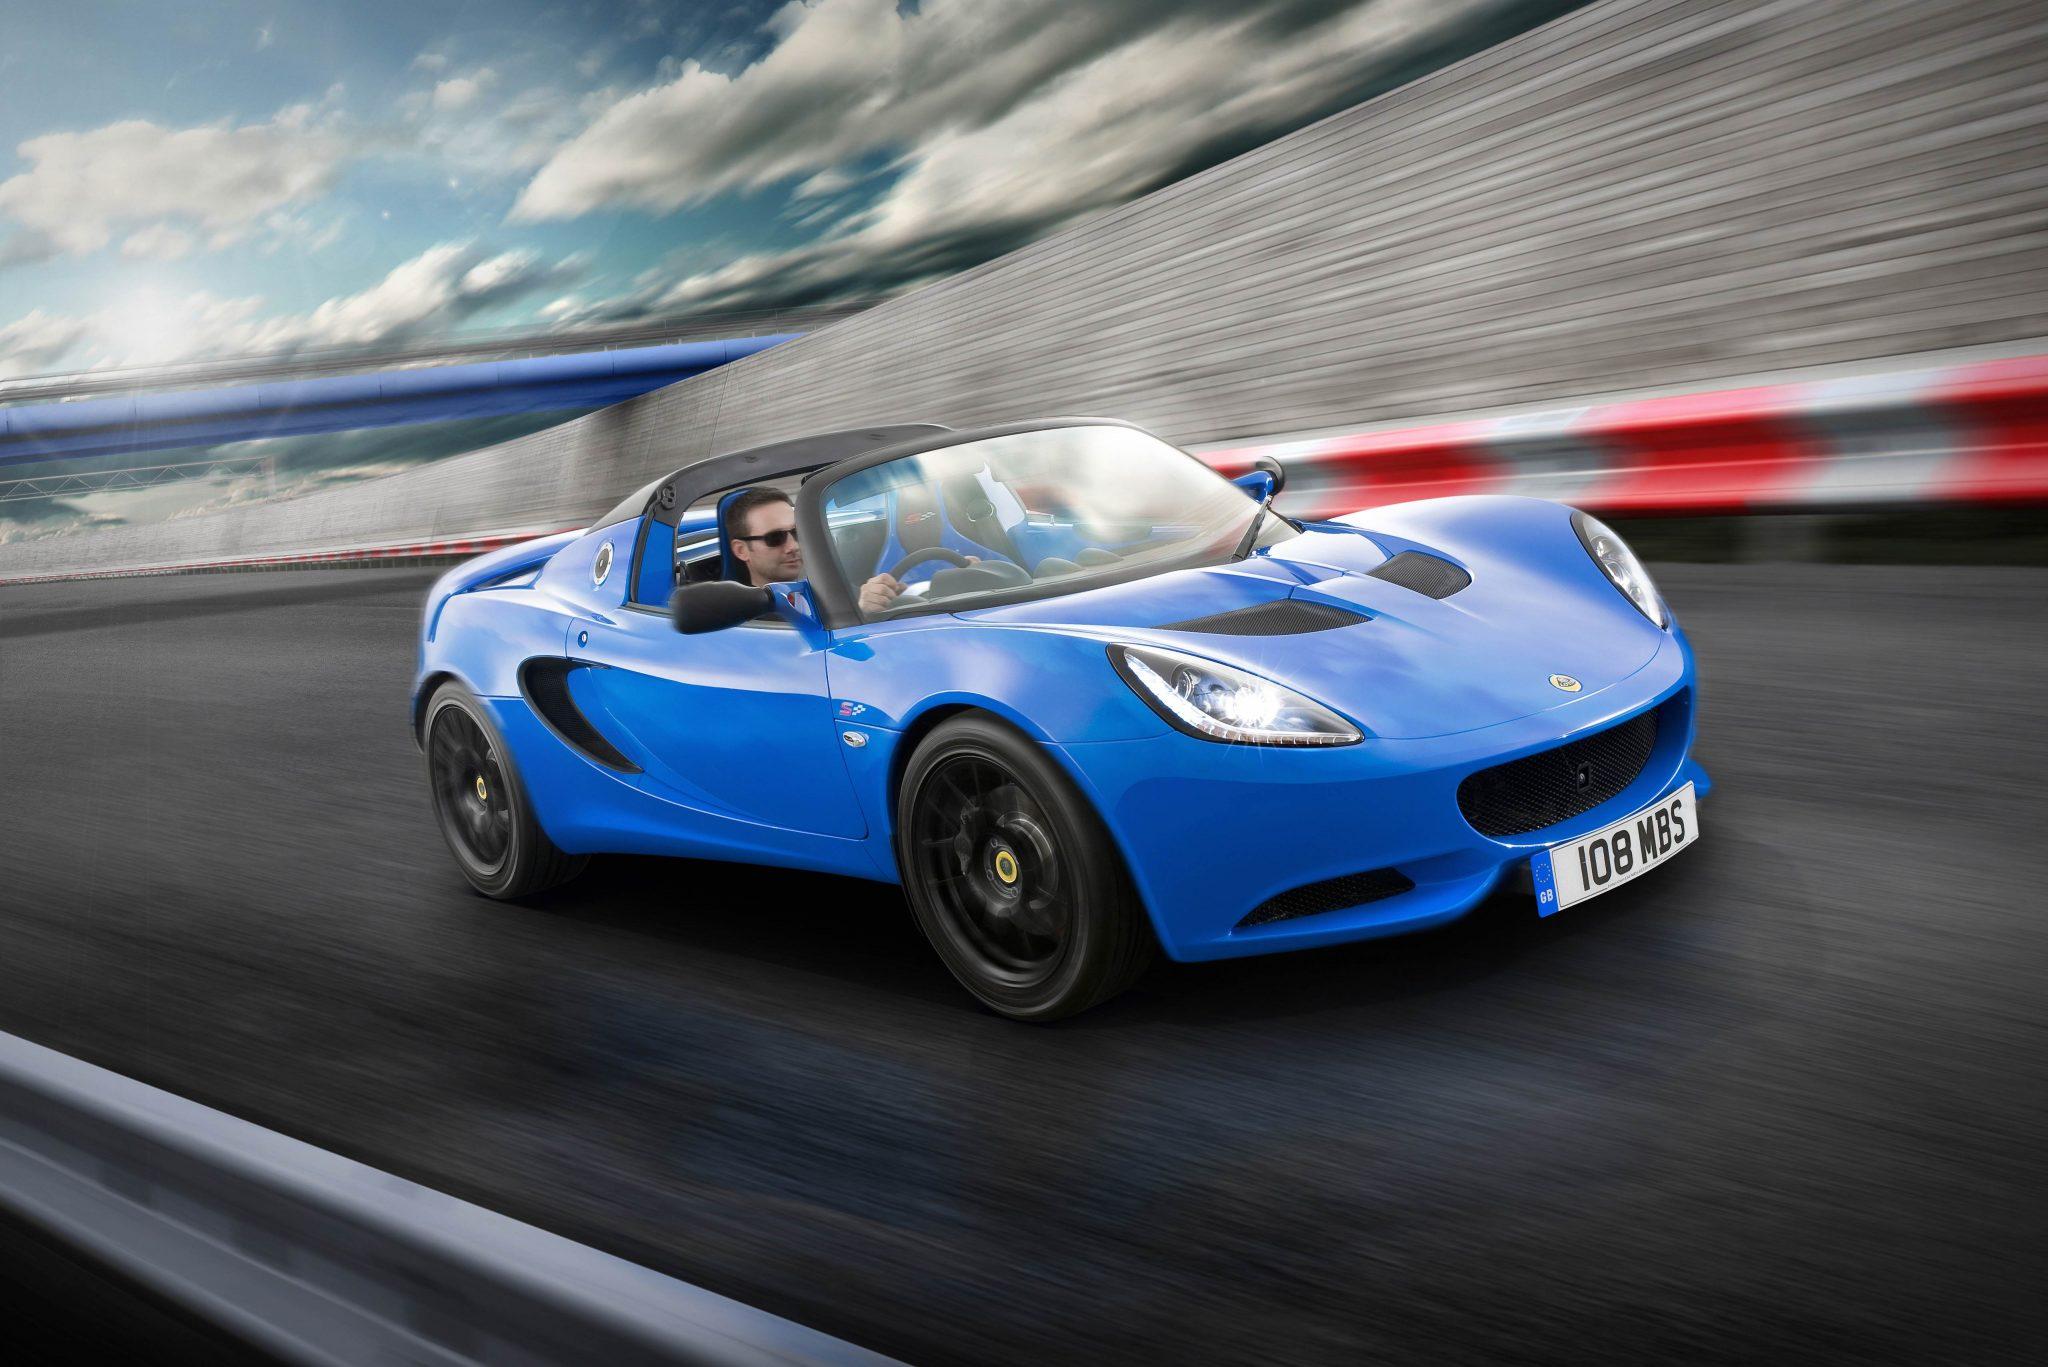 News: Lotus Elise S Club Racer On Sale Now